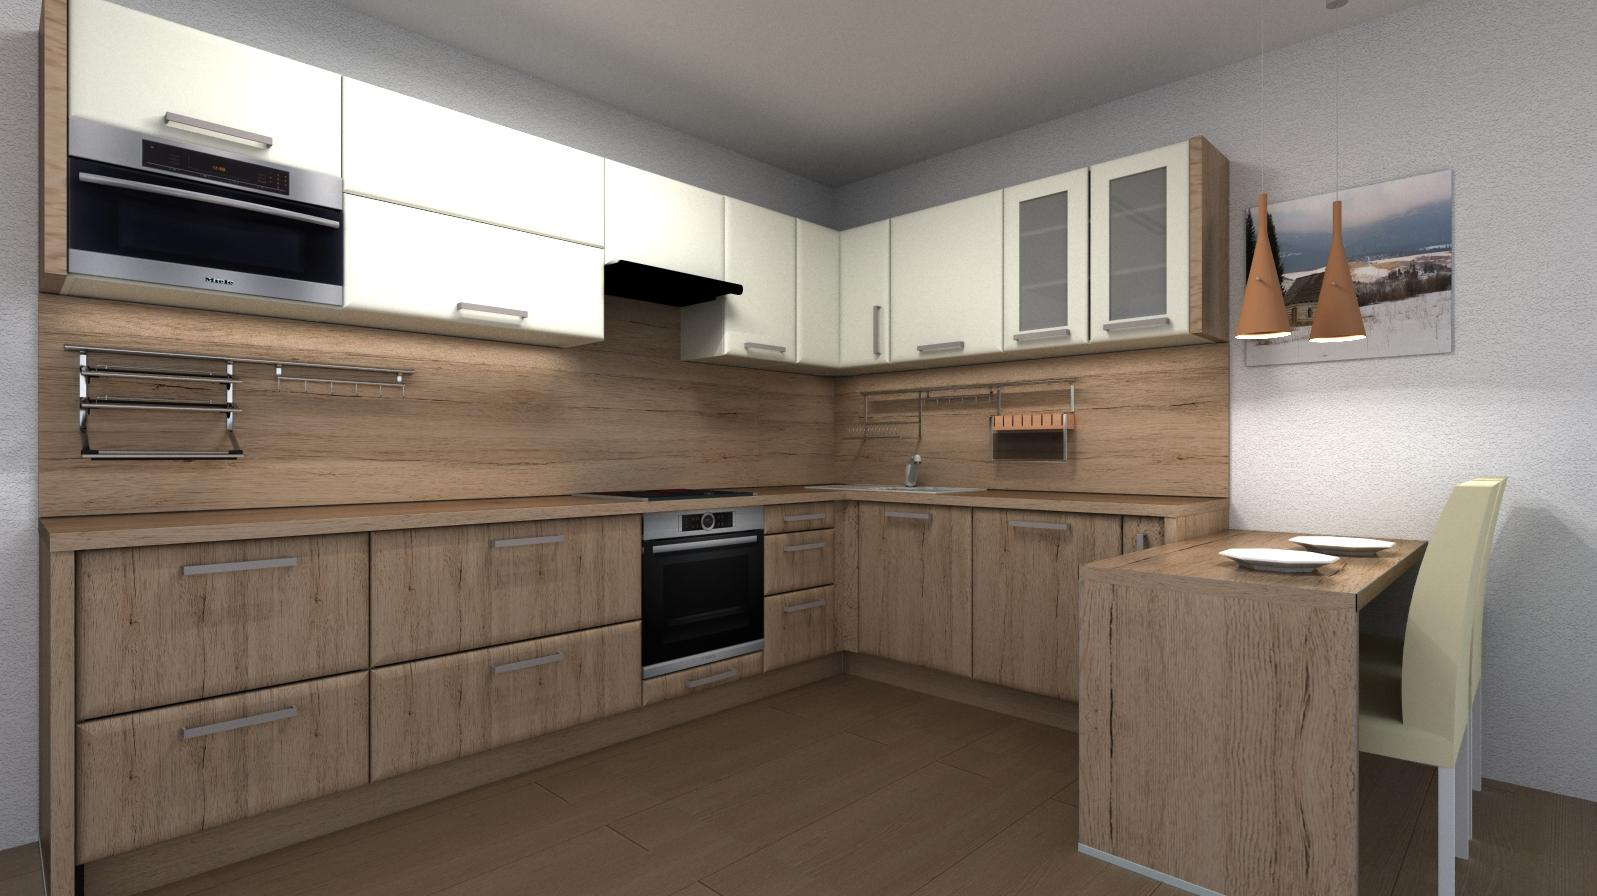 Kuchyne - Obrázok č. 8